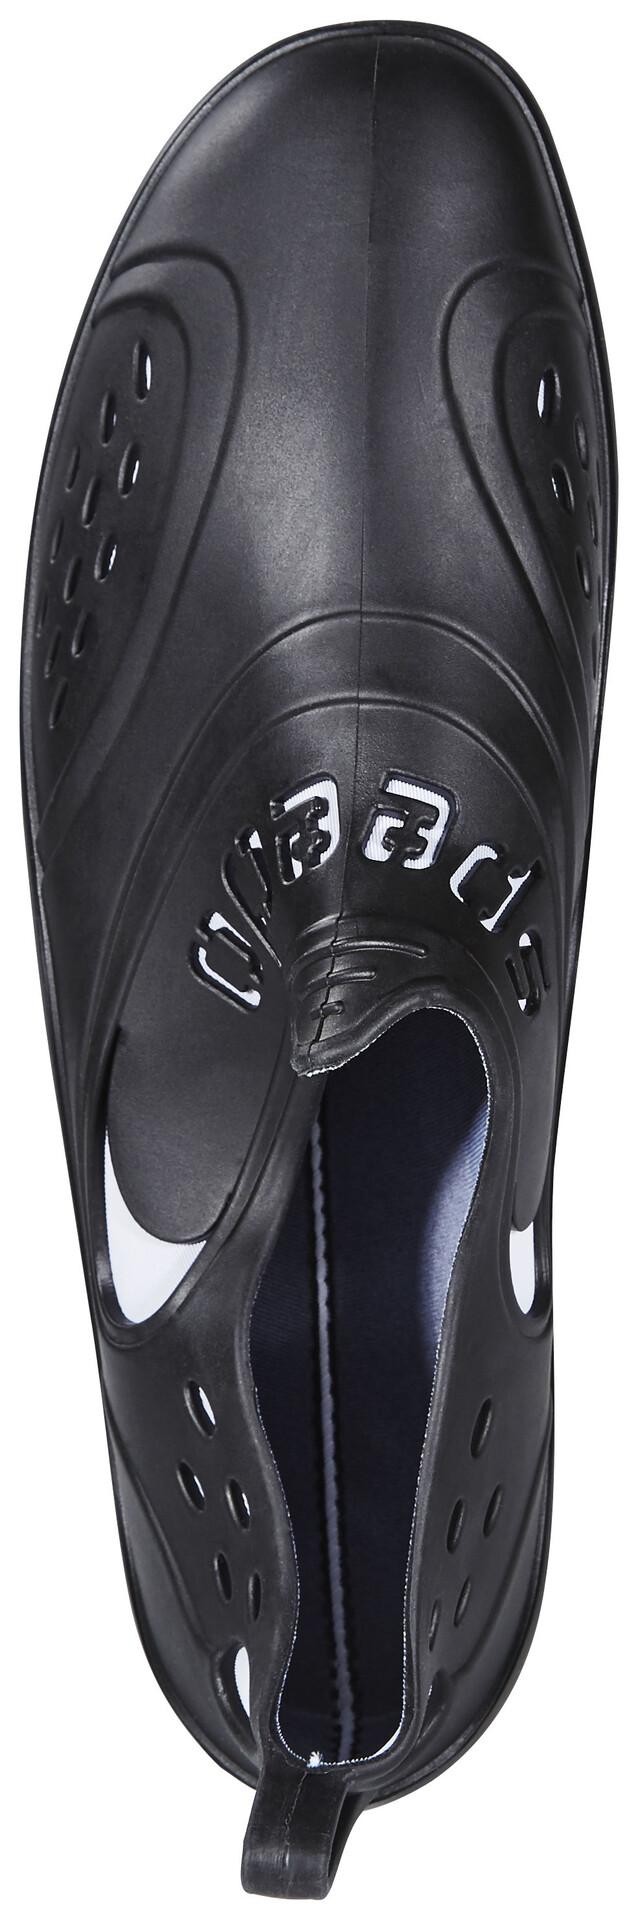 Zanpa Aquatiques Zanpa Chaussures Aquatiques Speedo HommeBlackwhite Chaussures Speedo shCtdrQ